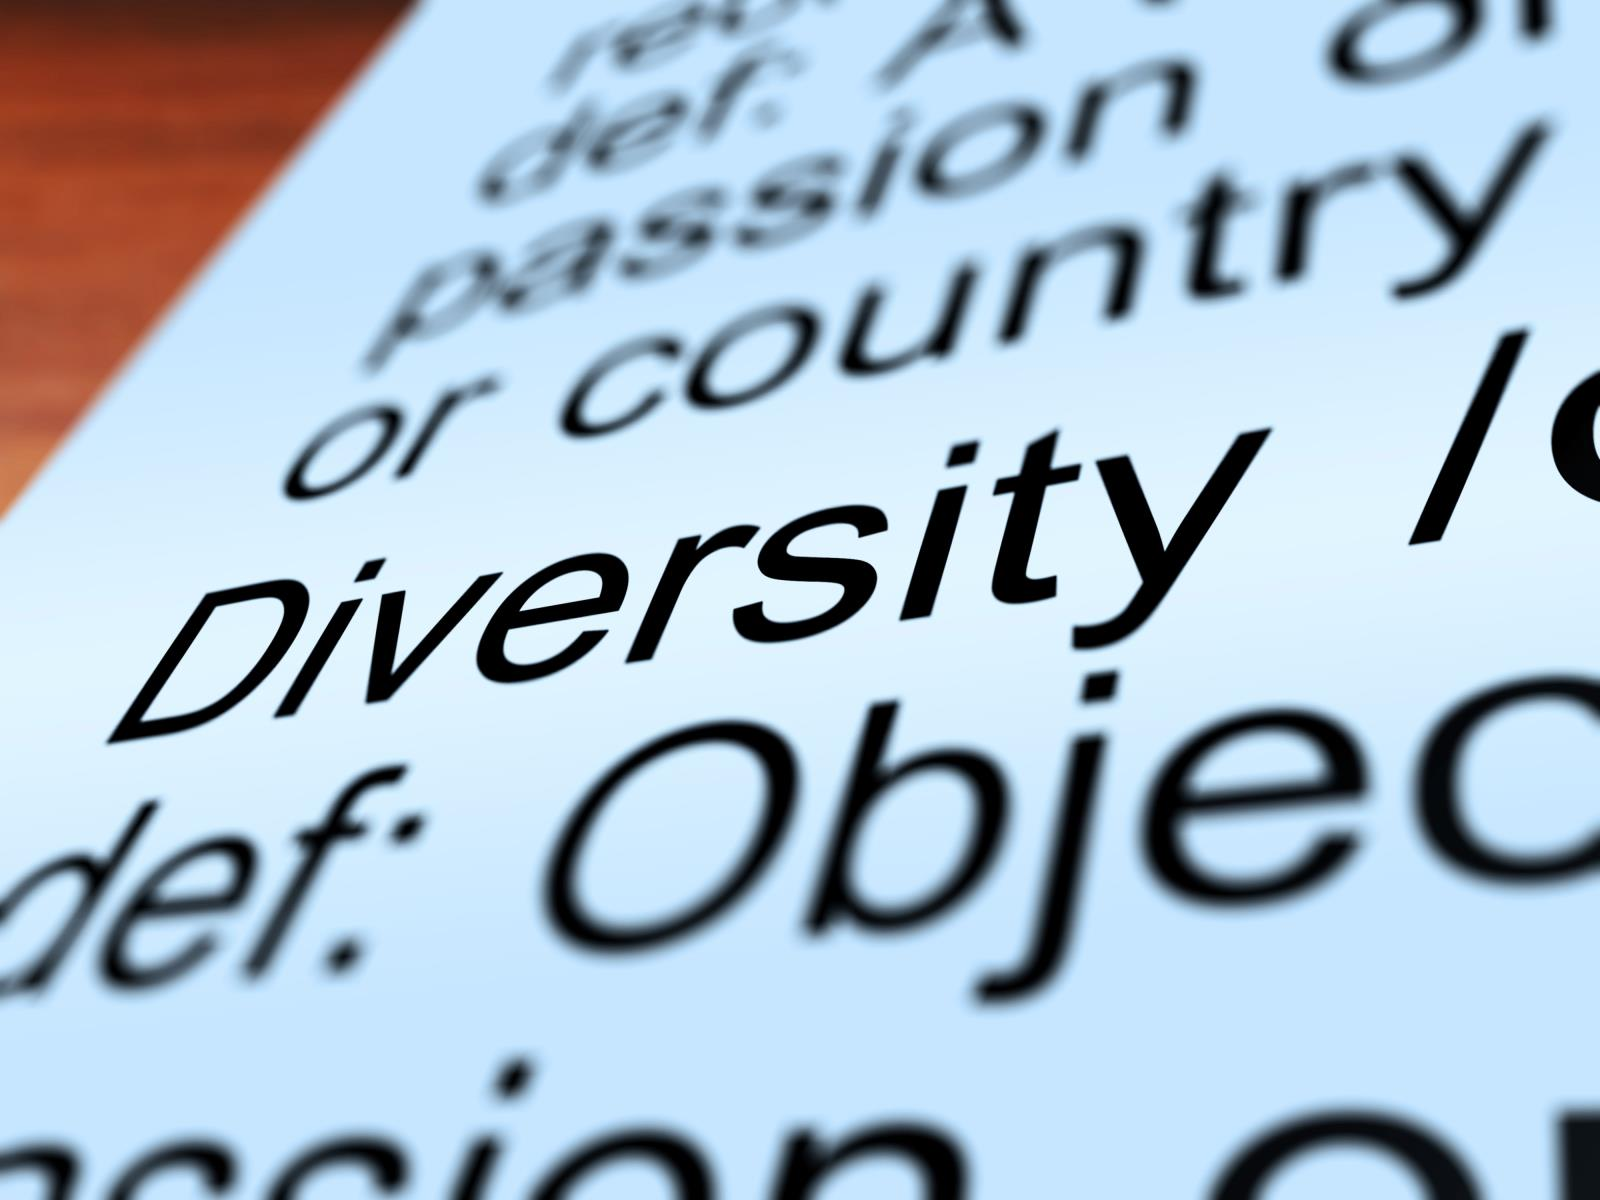 diversity-definition-closeup-showing-different-or-diverse_z1xN9Mwu